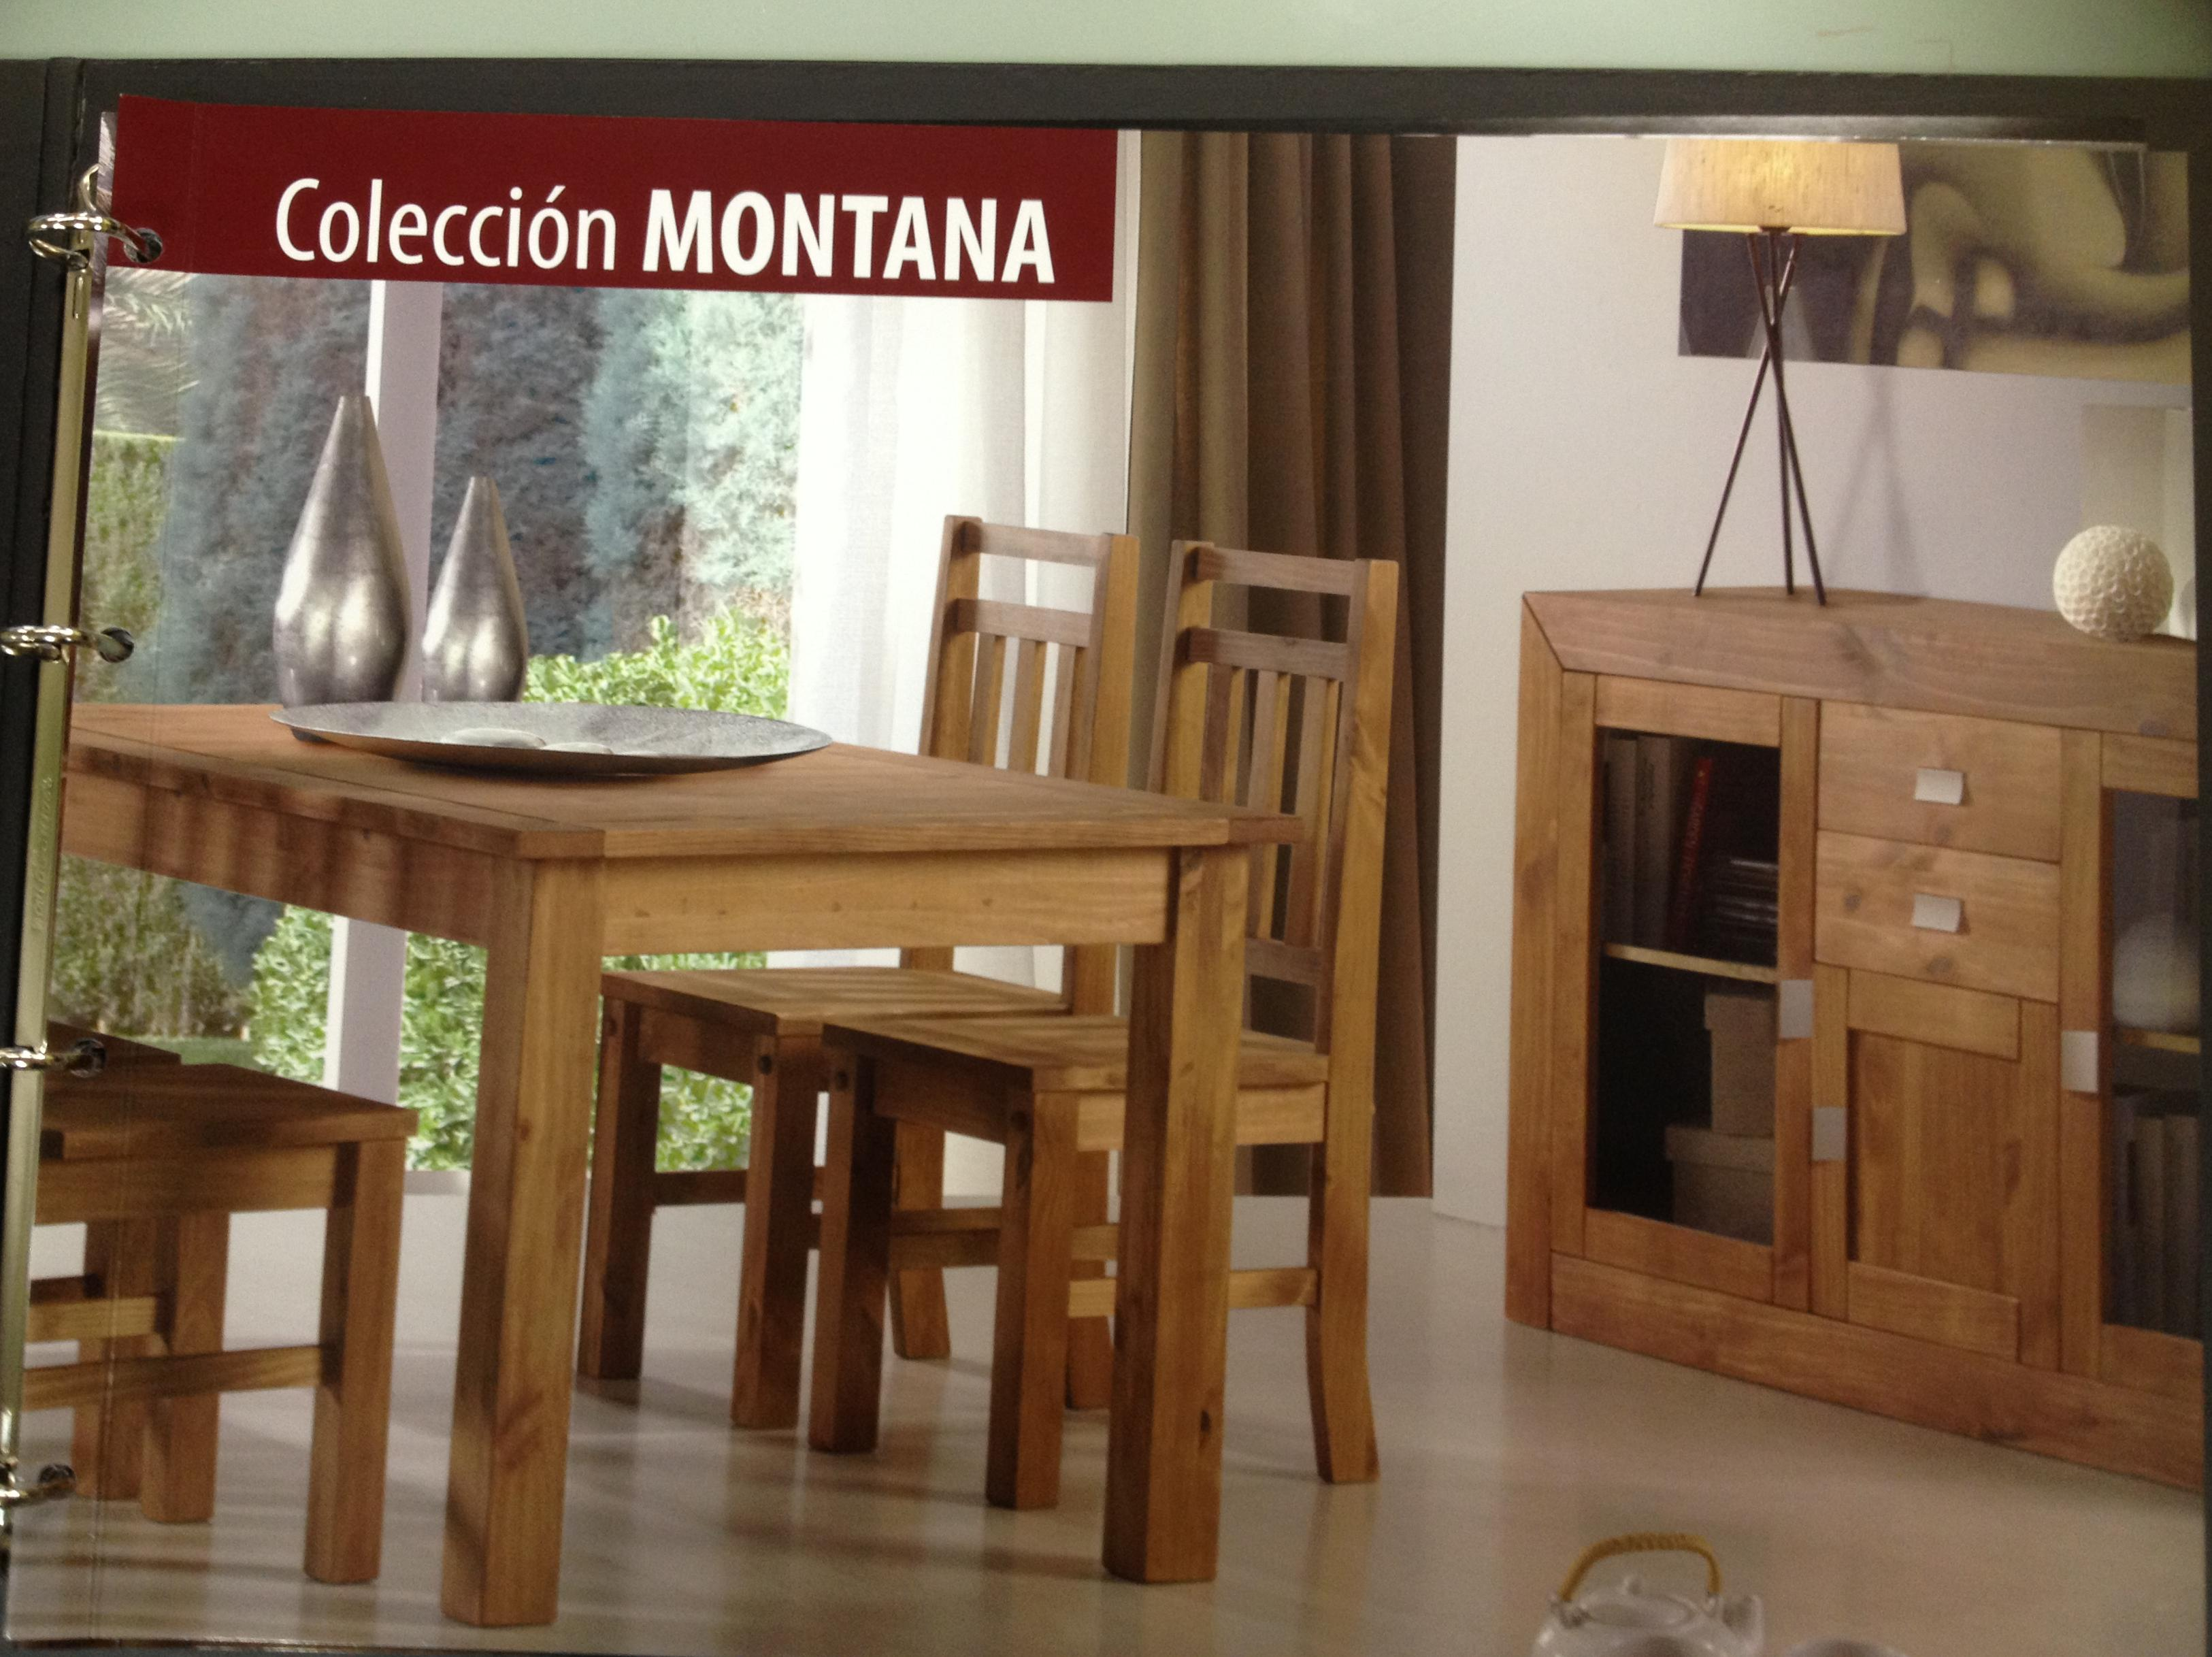 COLECCION MONTANA: Catálogo de Ebani Hispánica, S.L.U.